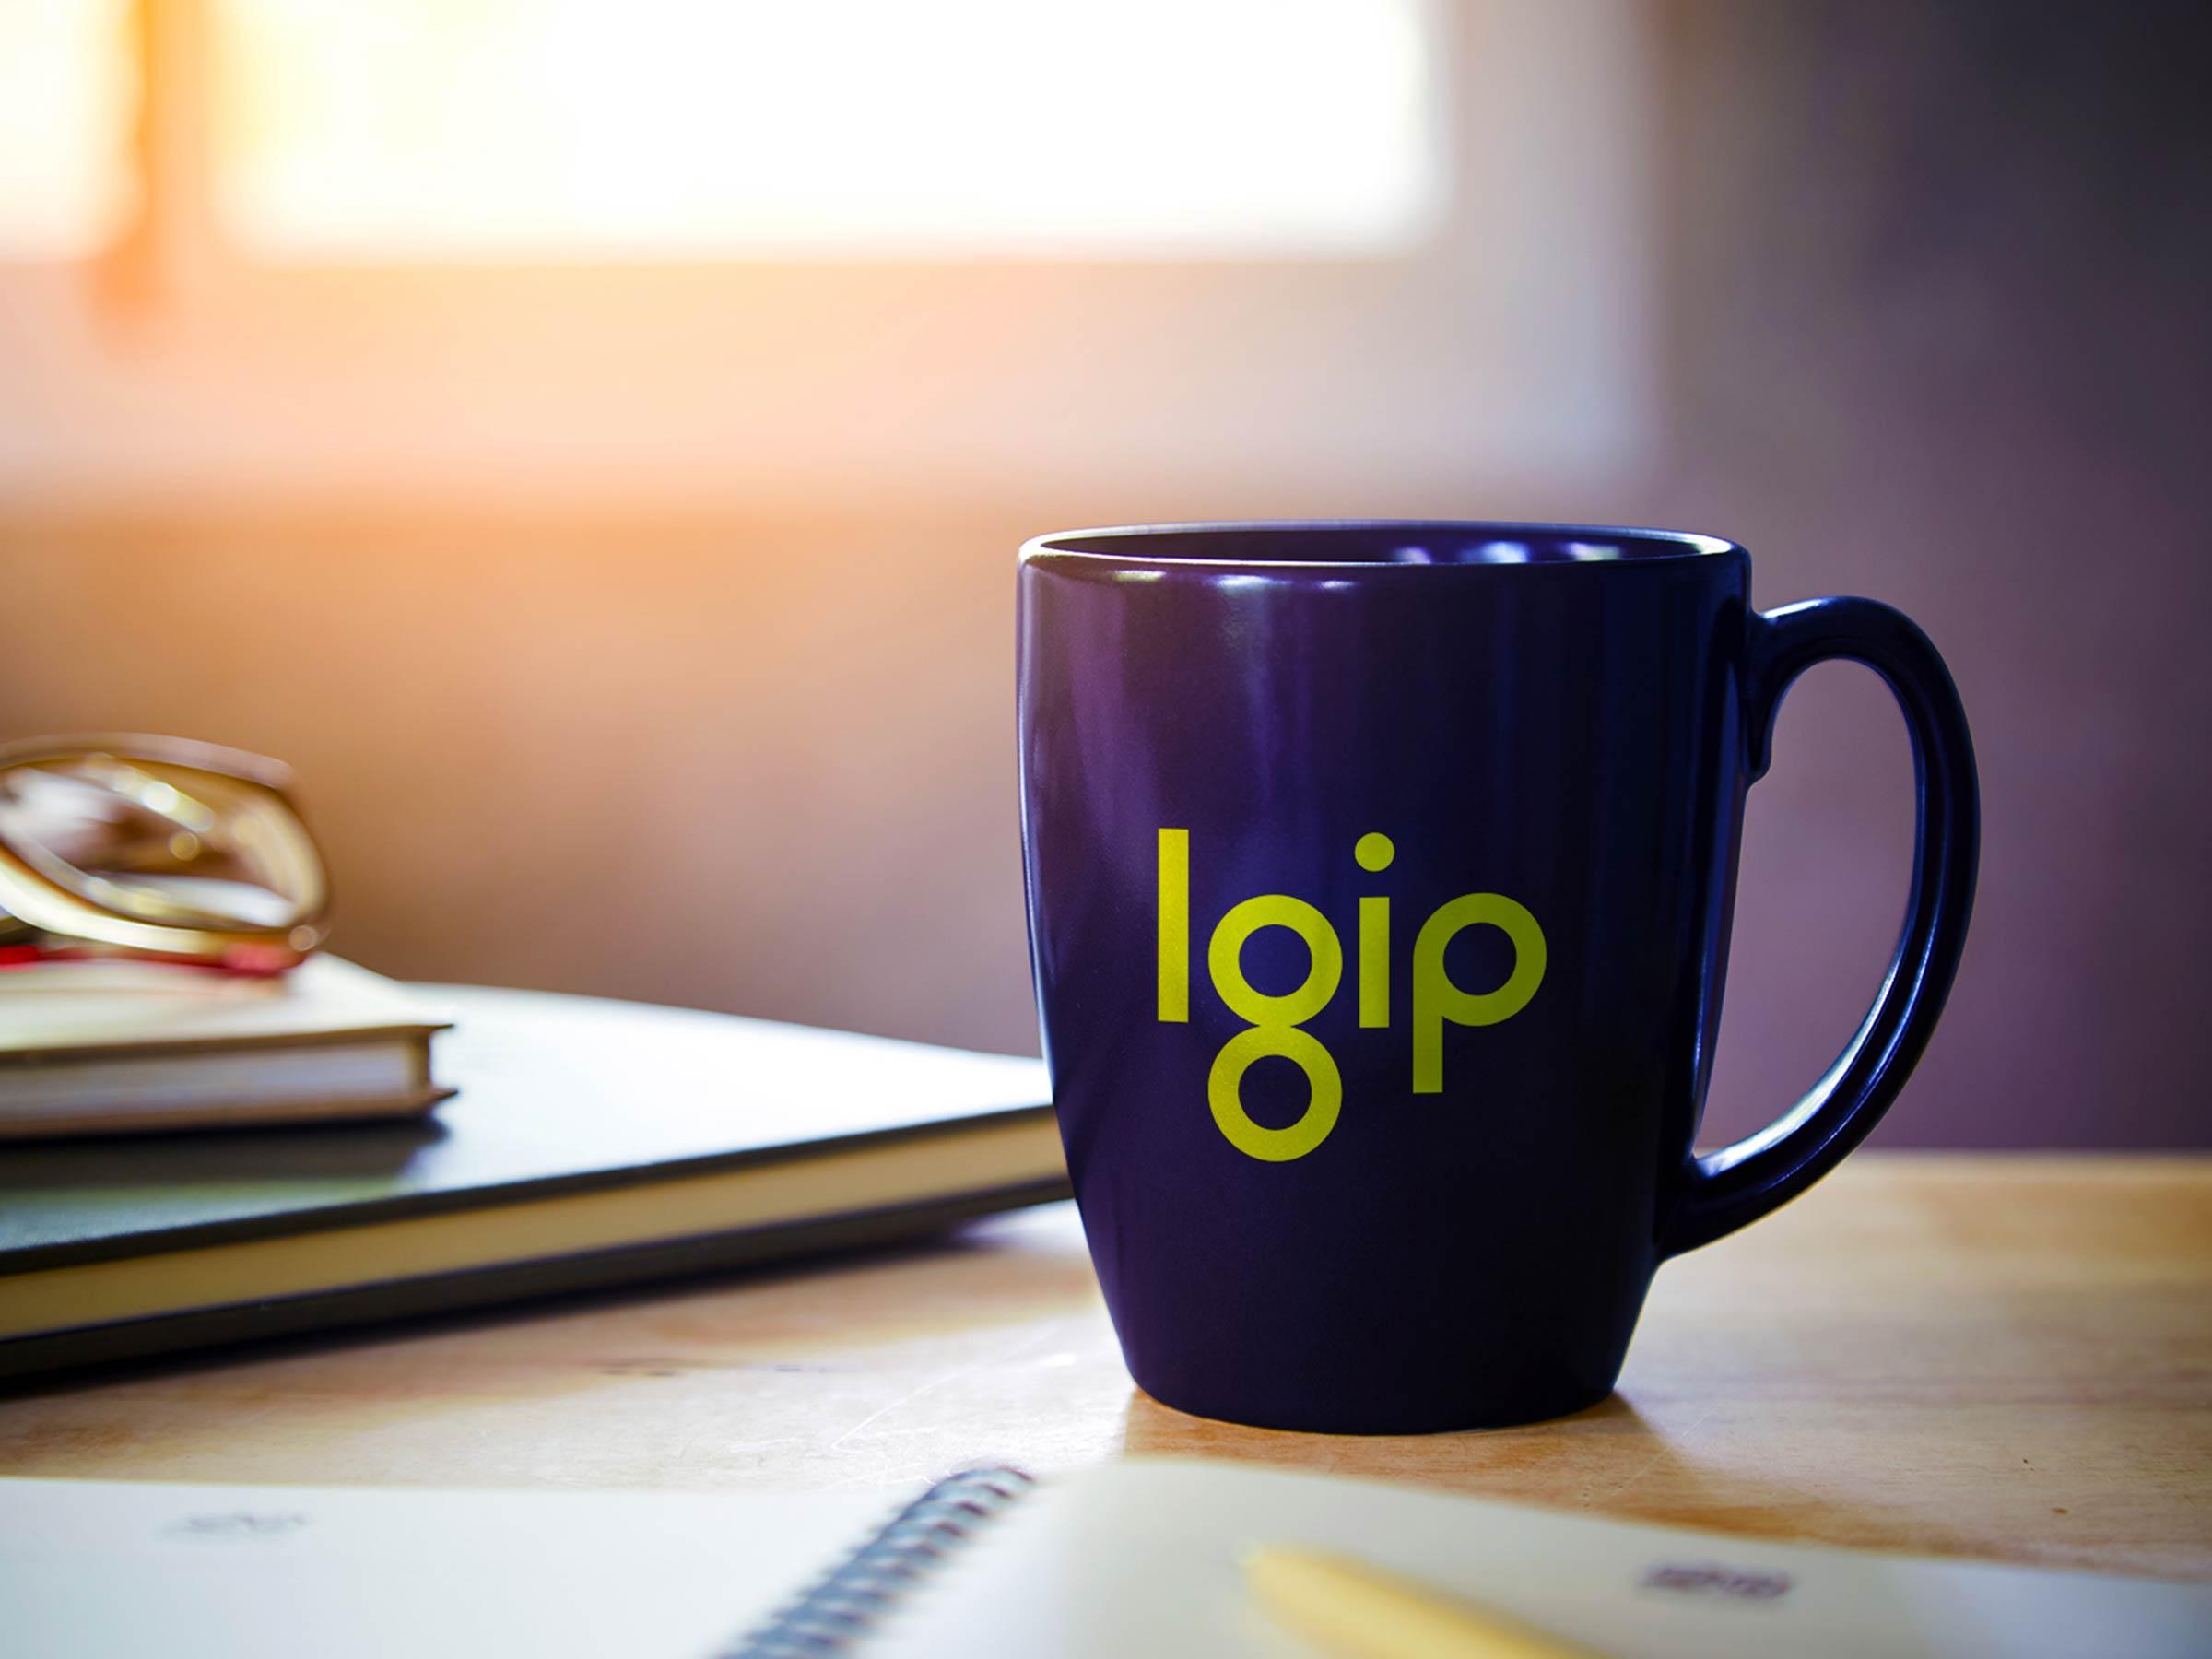 LGIP mug